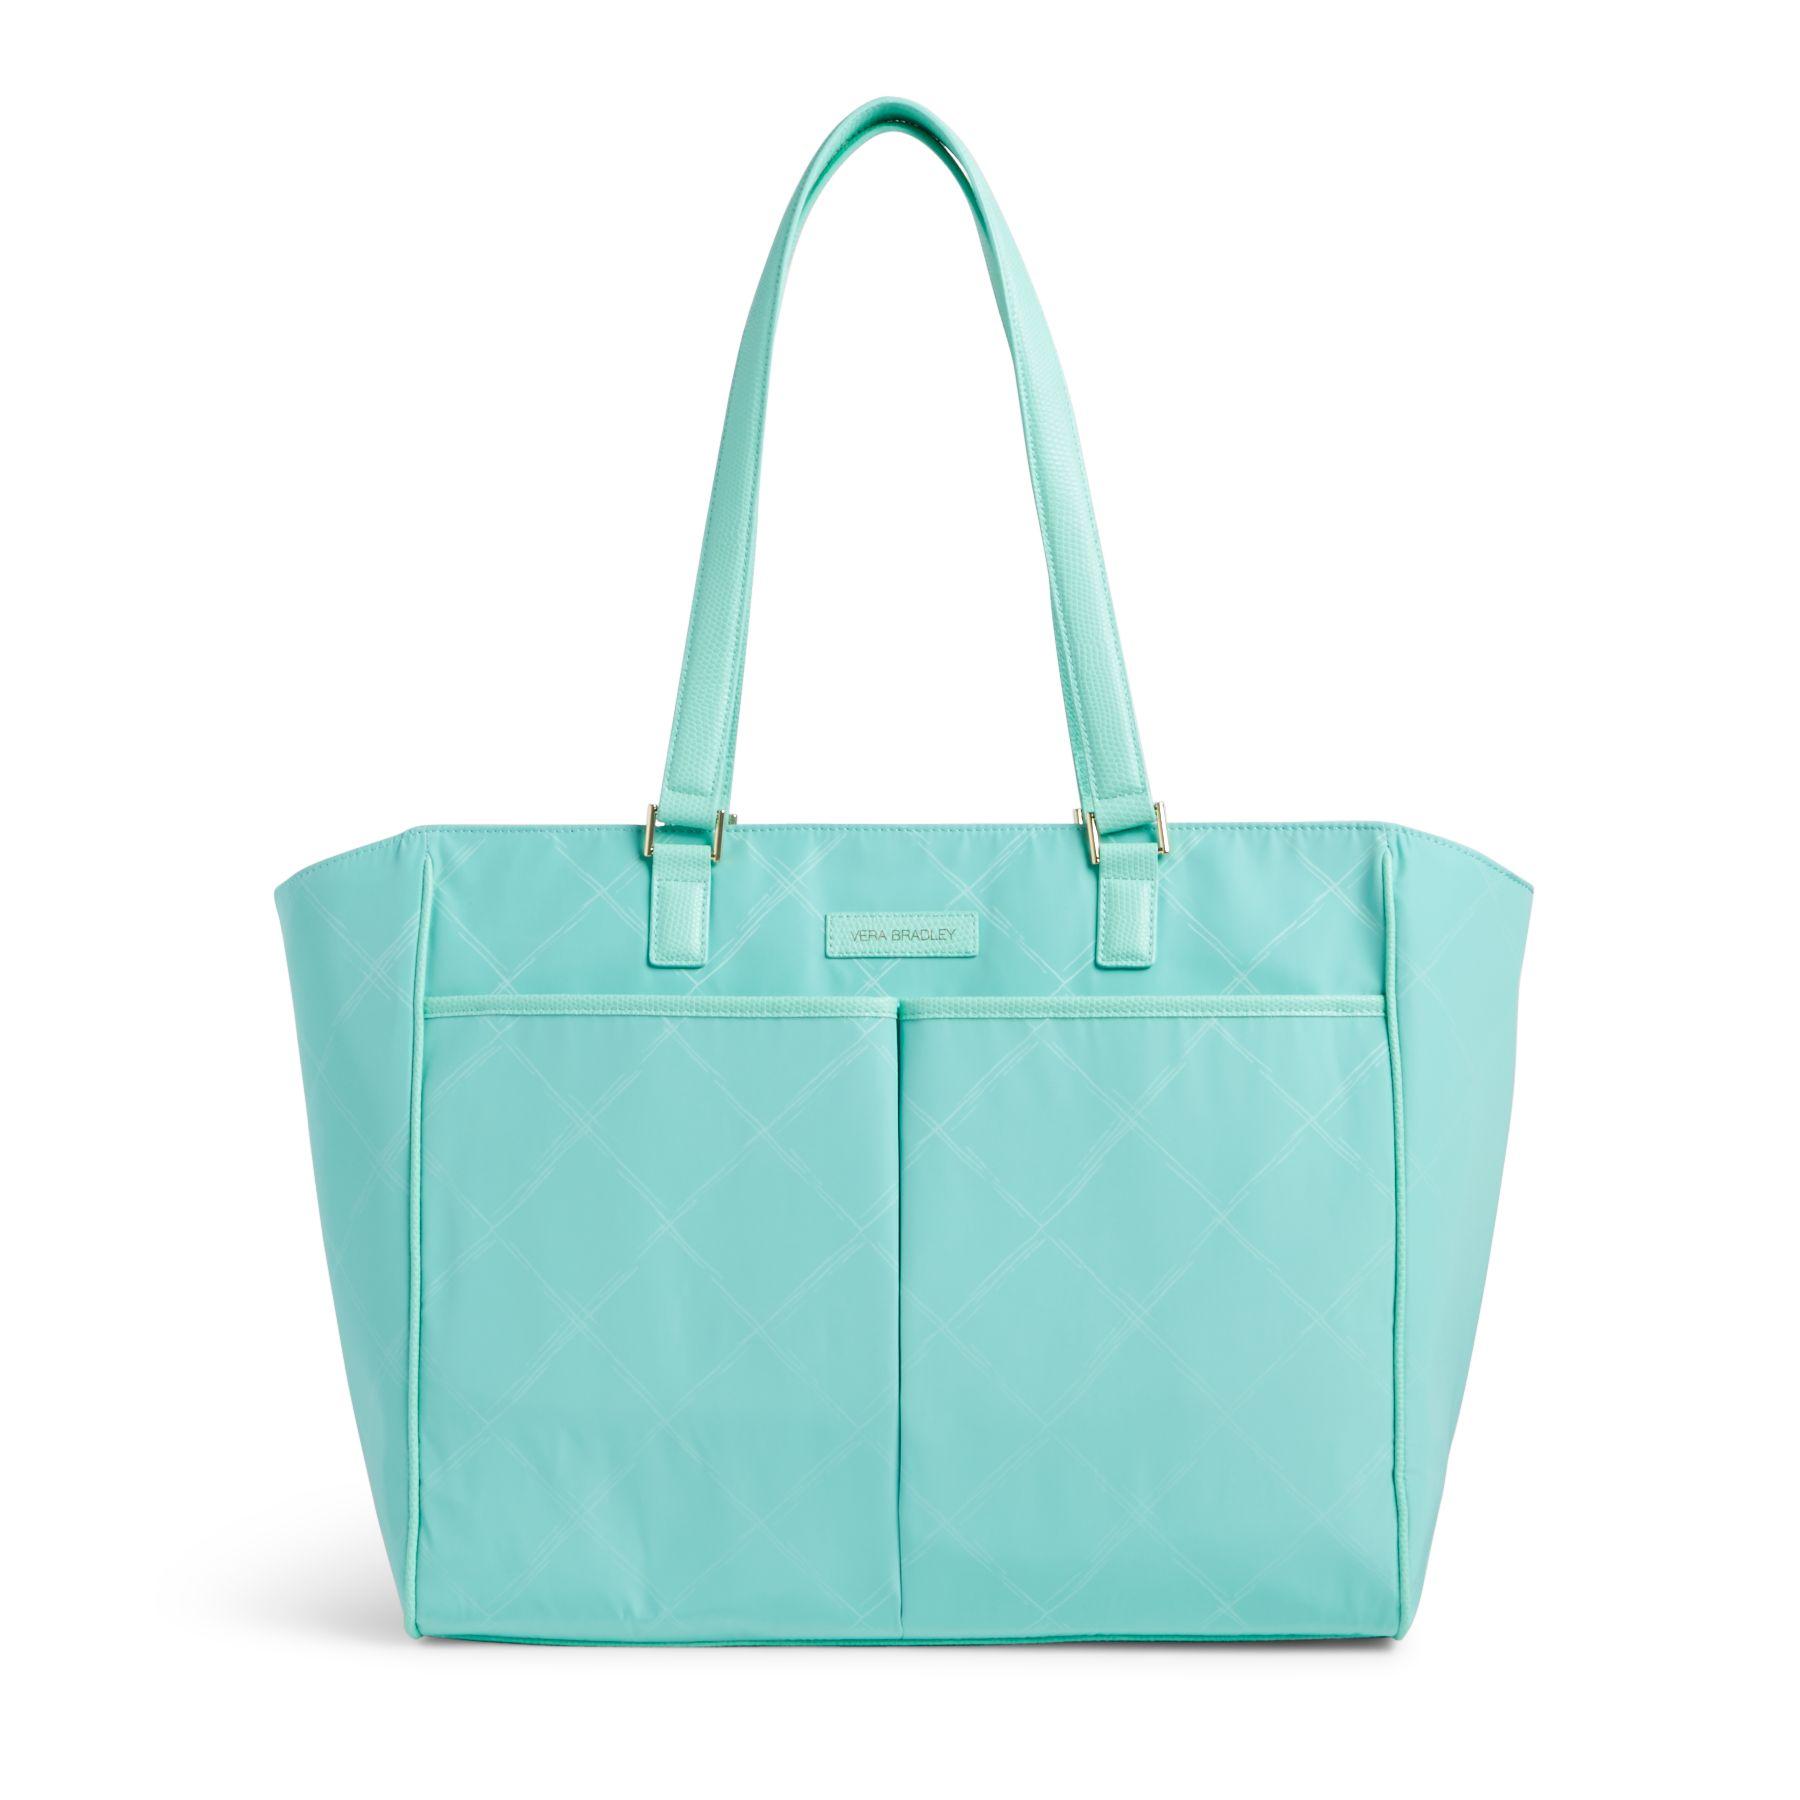 Vera Bradley Preppy Poly Uptown Baby Bag in Mint